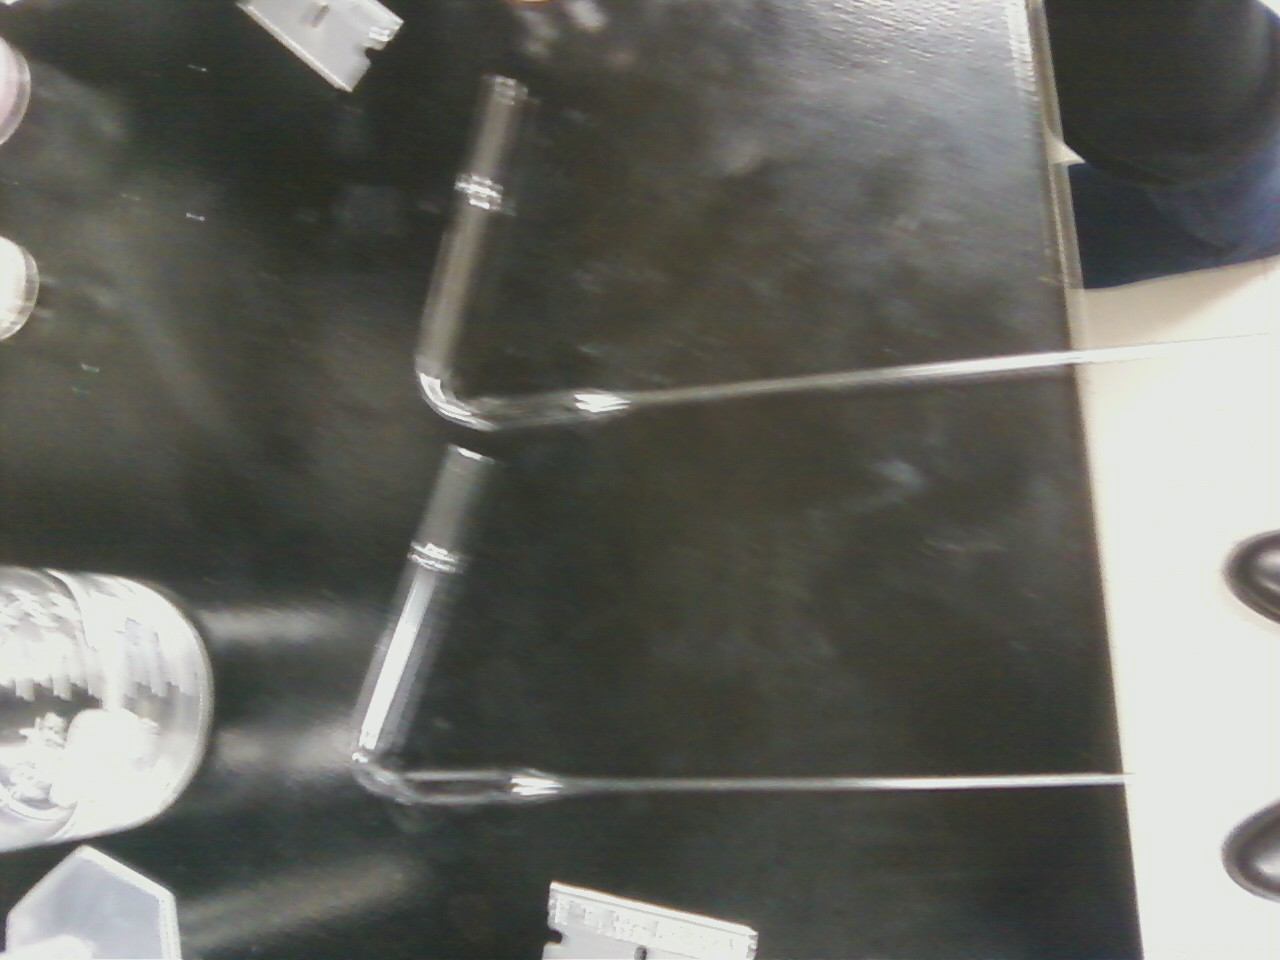 Bent pipette 2 27 13.jpg